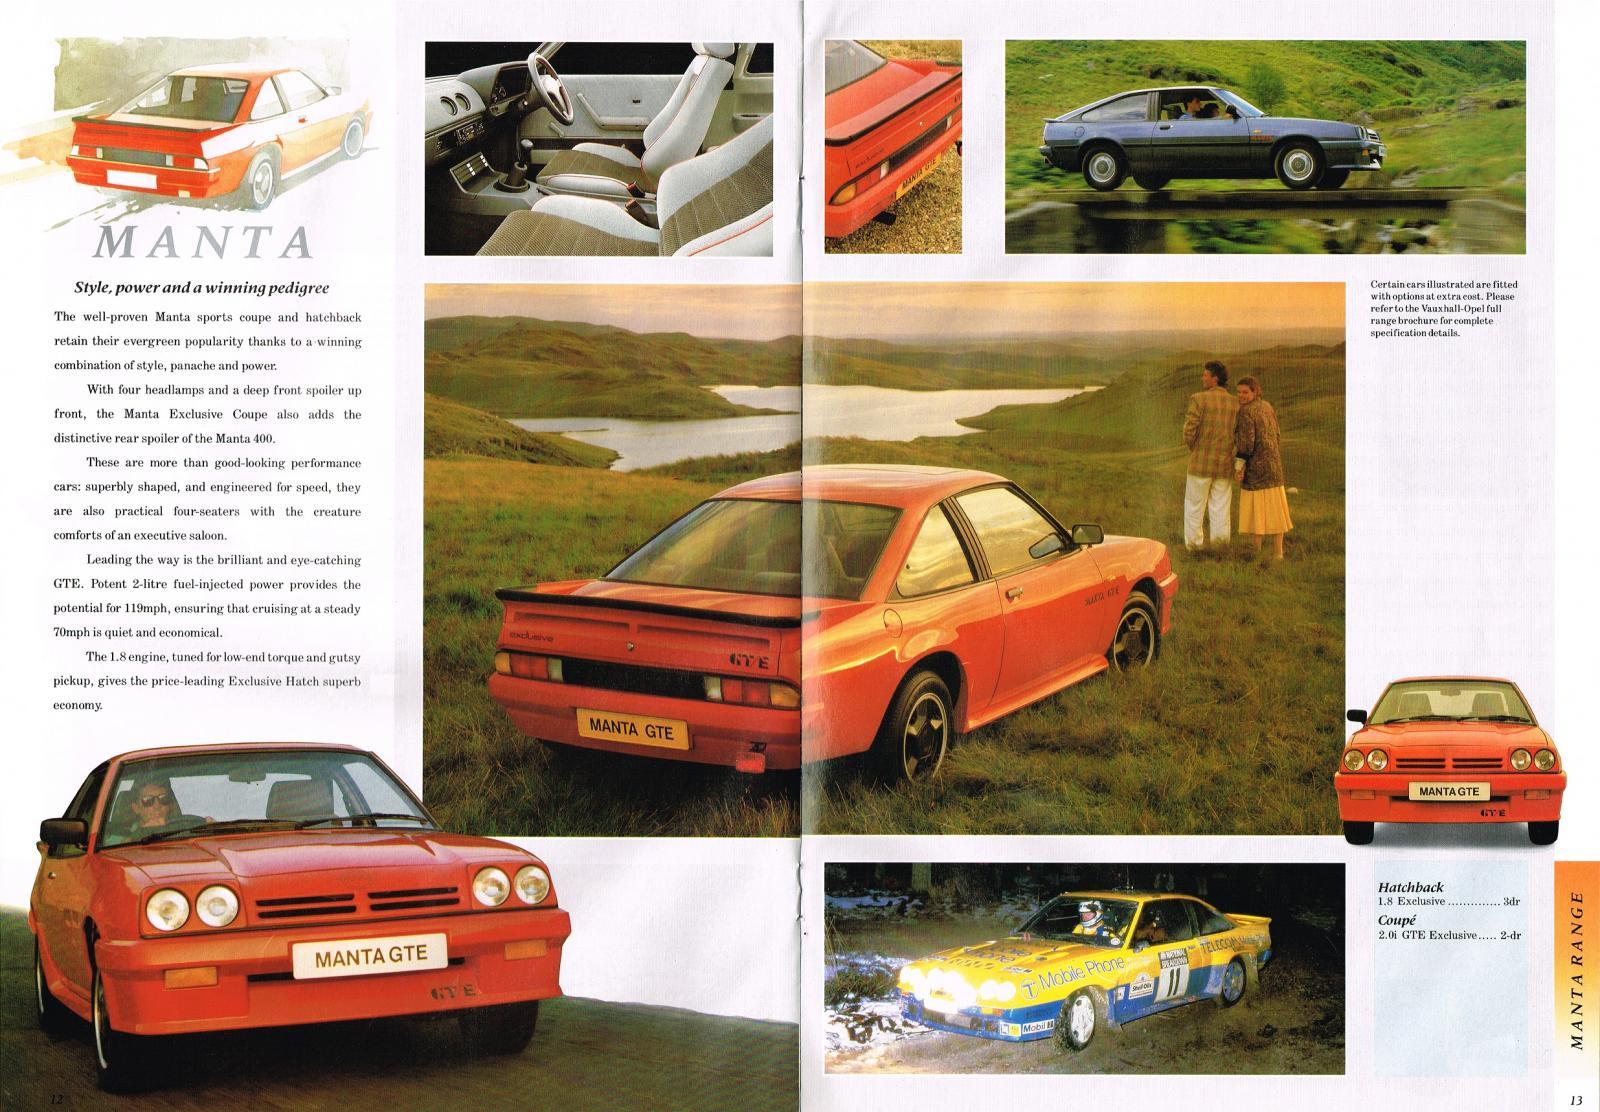 Vauxhall Opel range Oct 1987 012-013 Manta.jpg